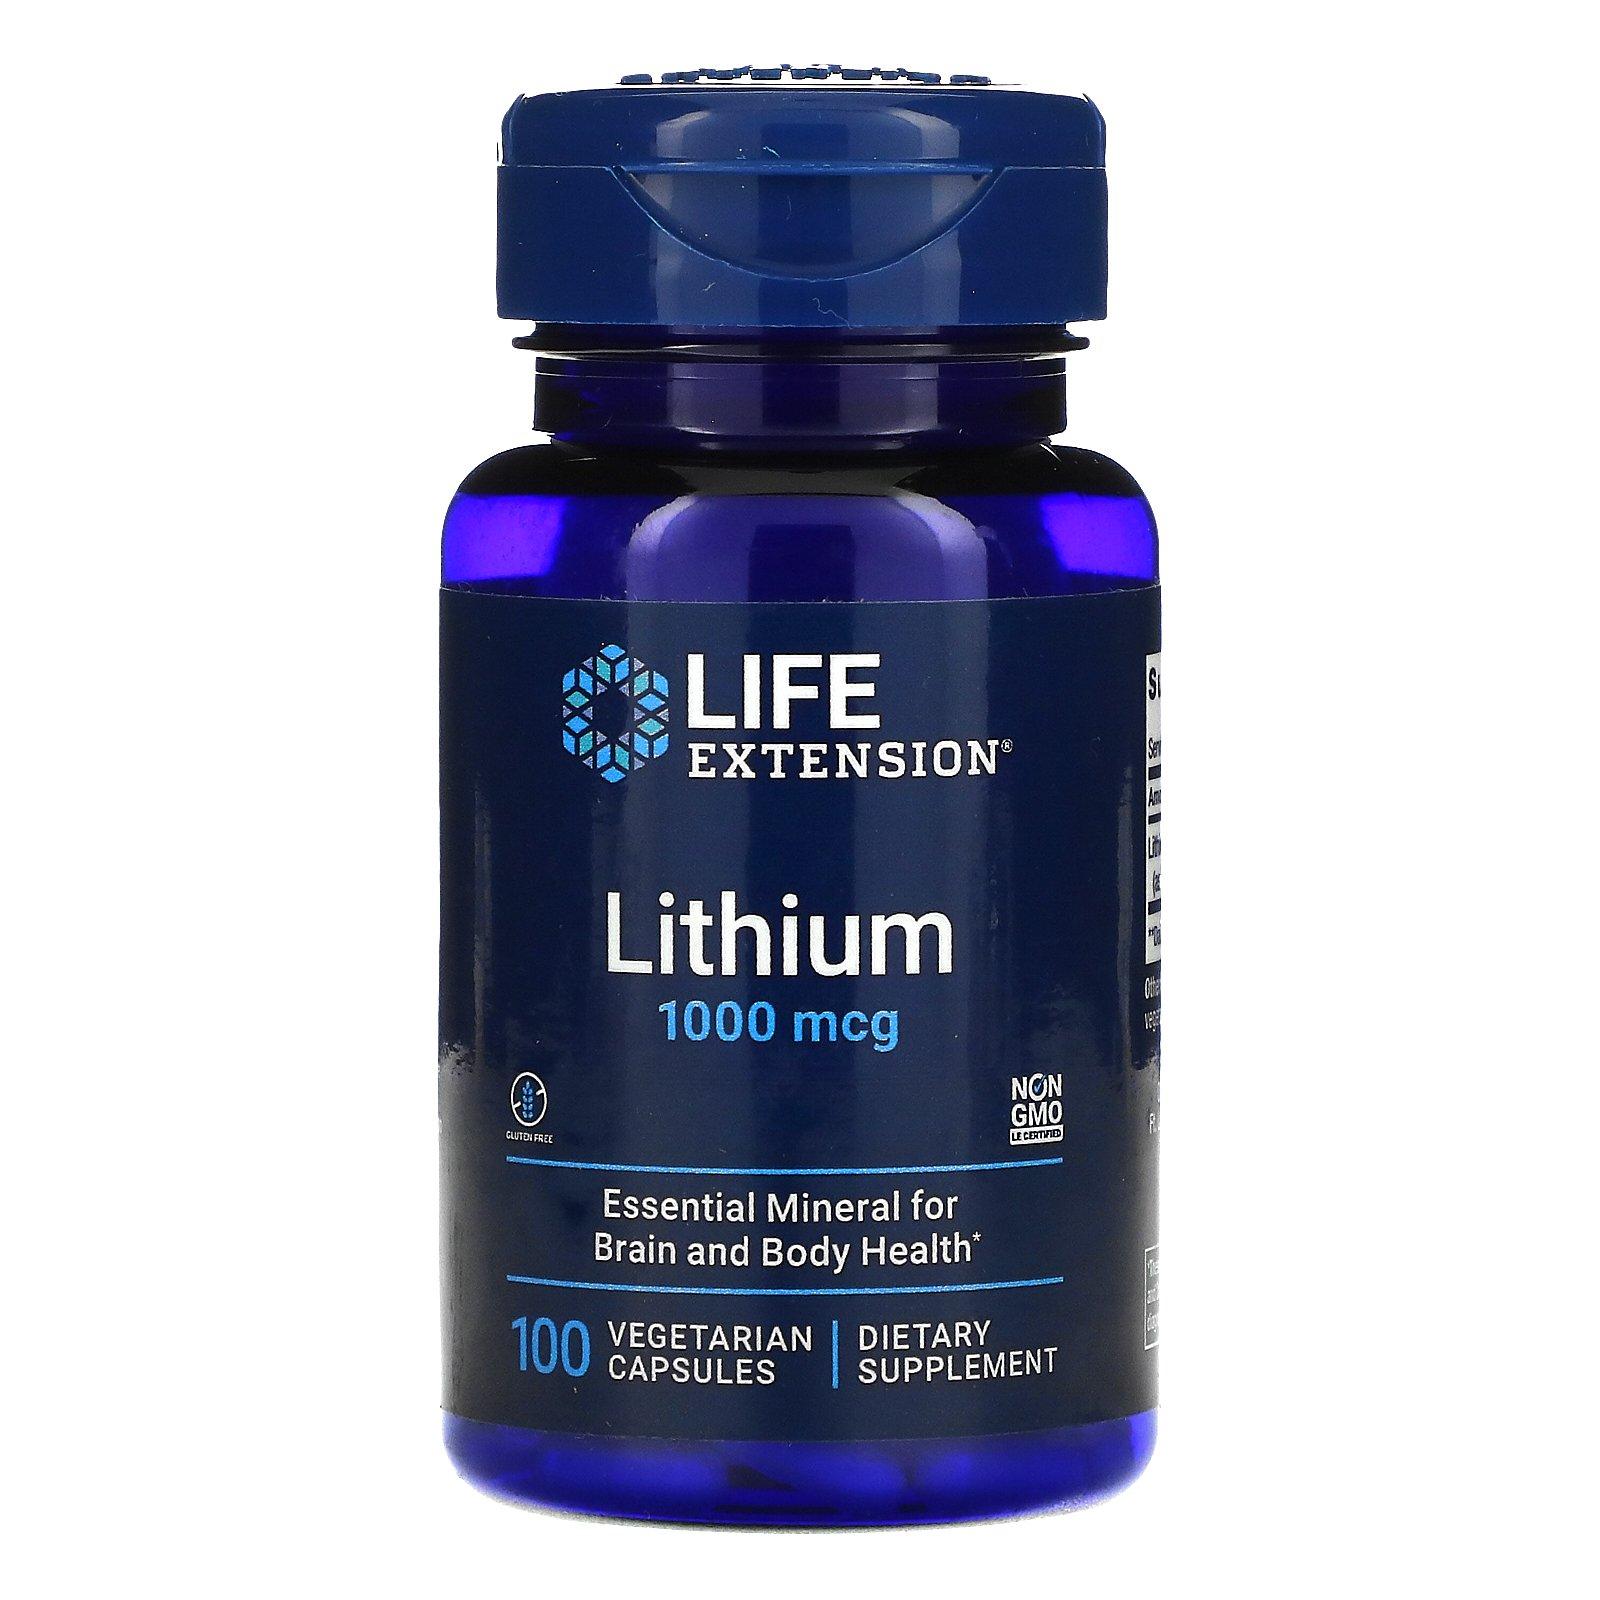 Life Extension, литий, 1000 мкг, 100 вегетарианских капсул